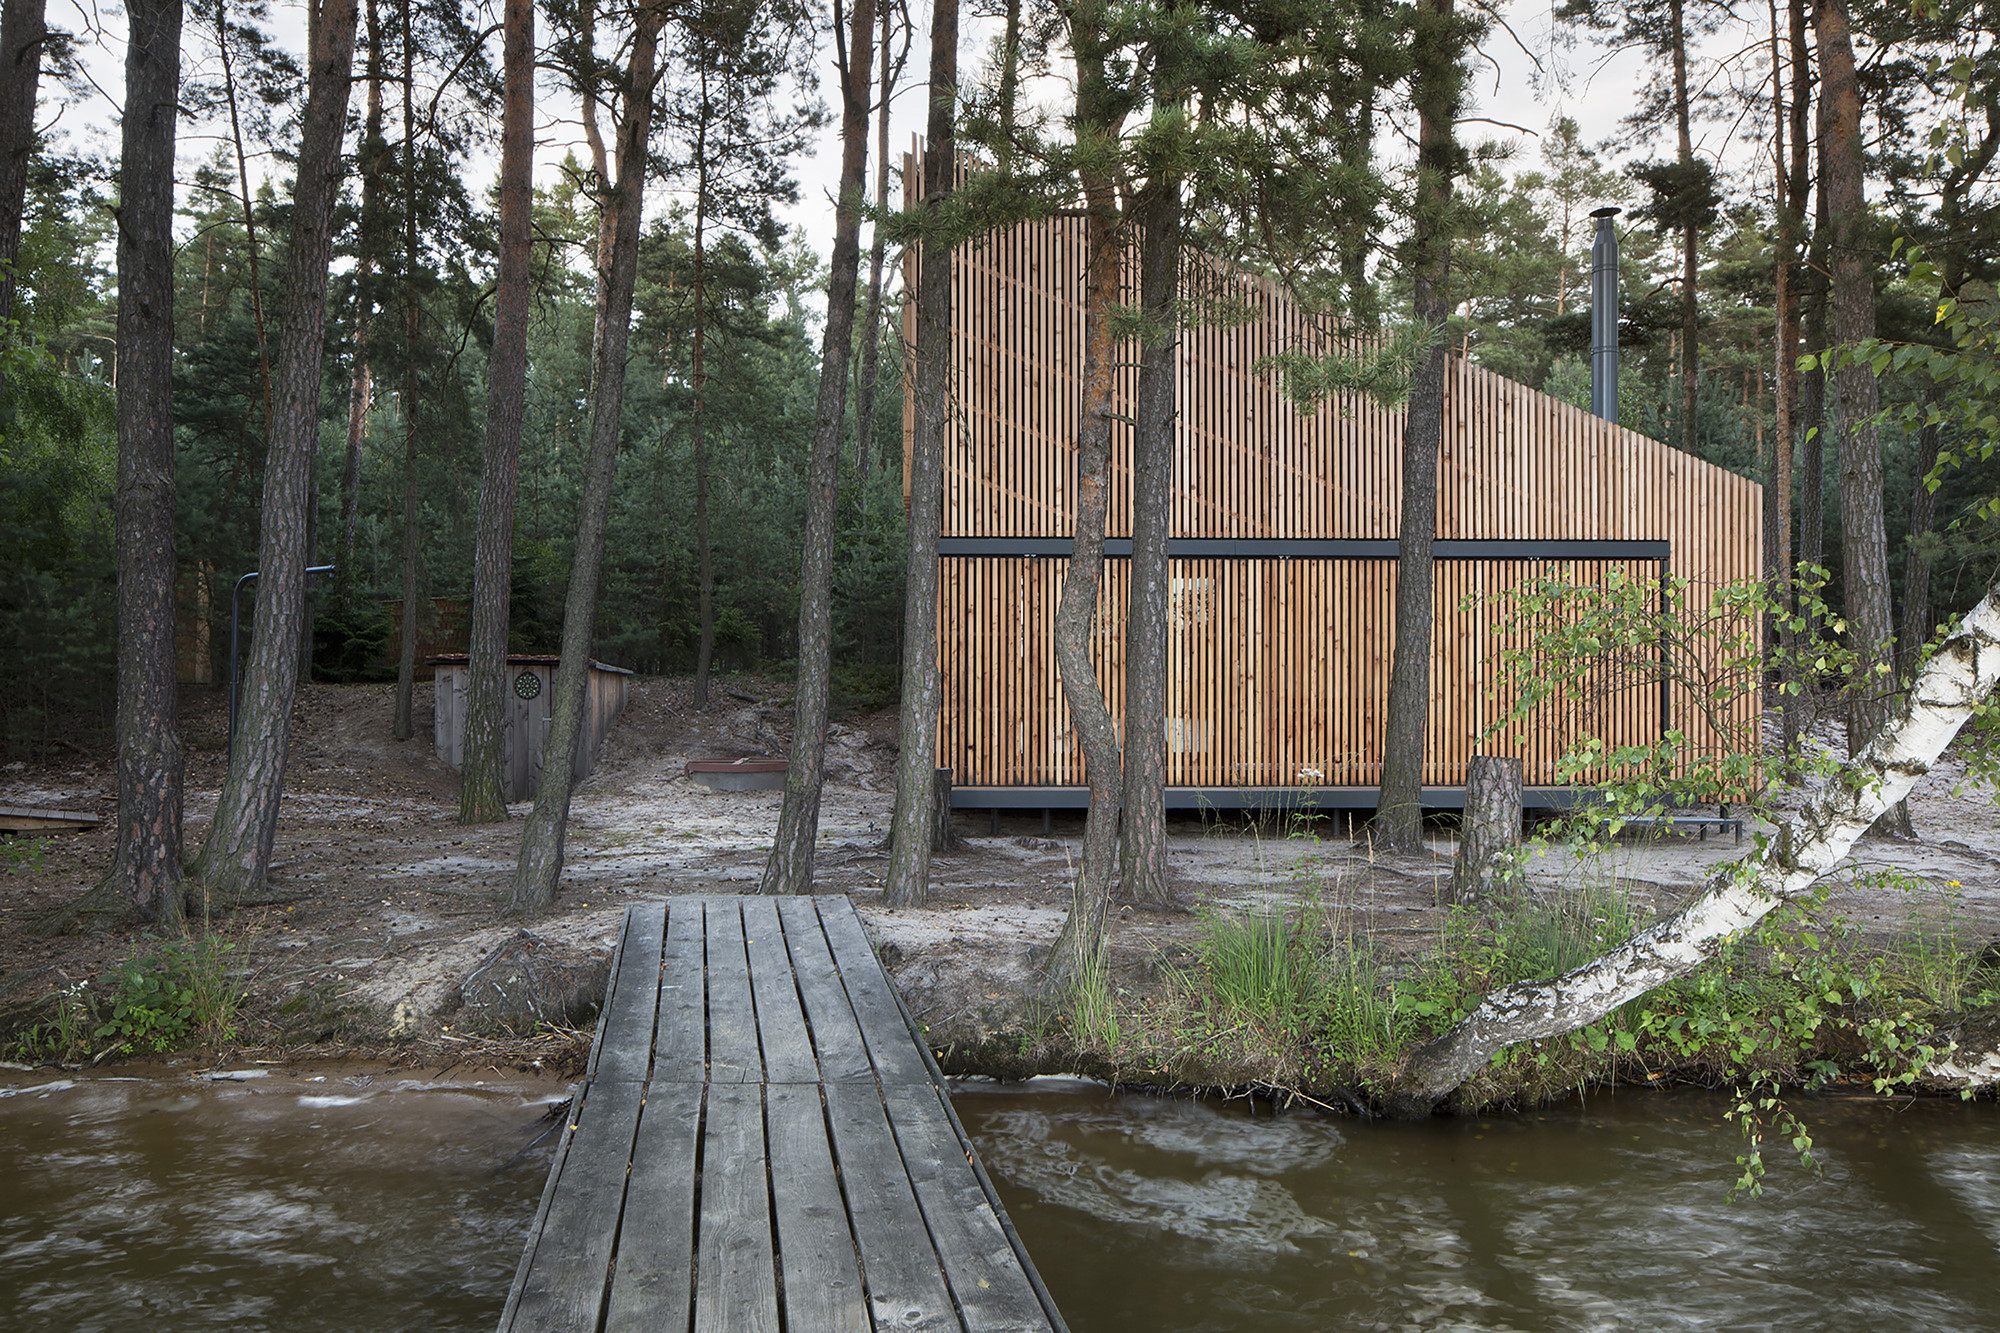 Cabaña del lago / FAM Architekti + Feilden+Mawson, © Tomas Balej